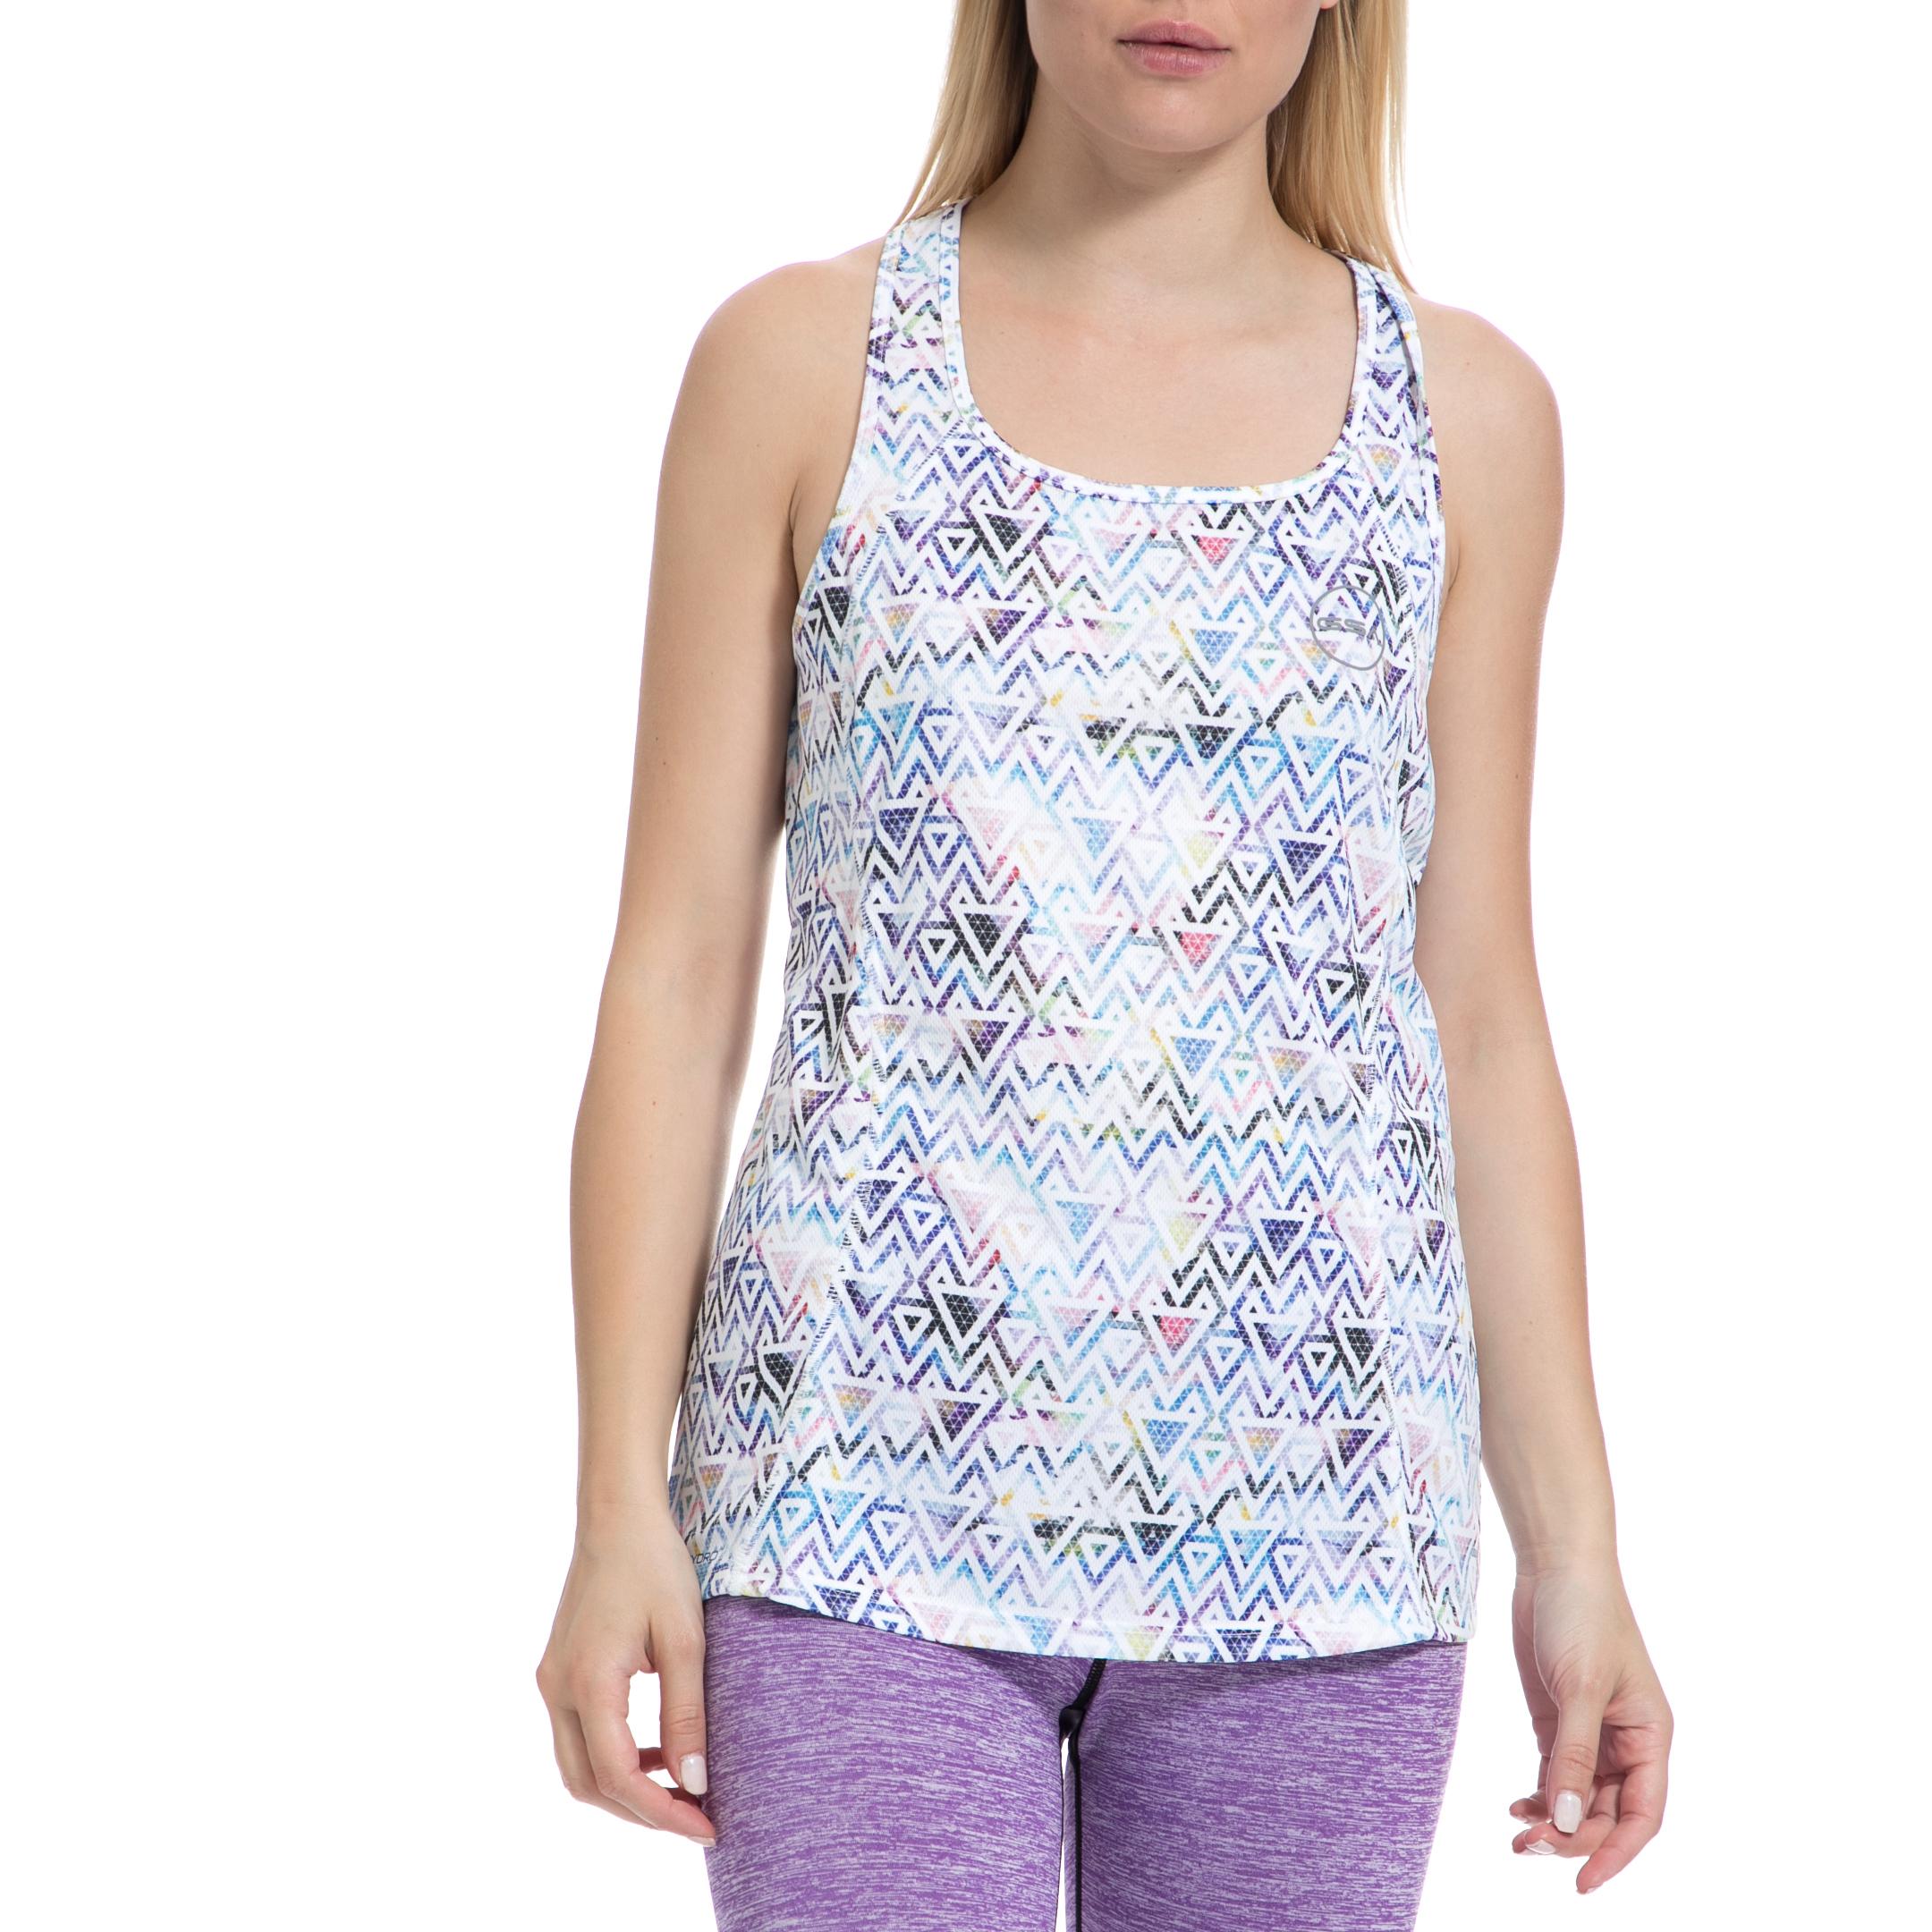 GSA - Γυναικεία μπλούζα GSA παστέλ γυναικεία ρούχα αθλητικά t shirt τοπ